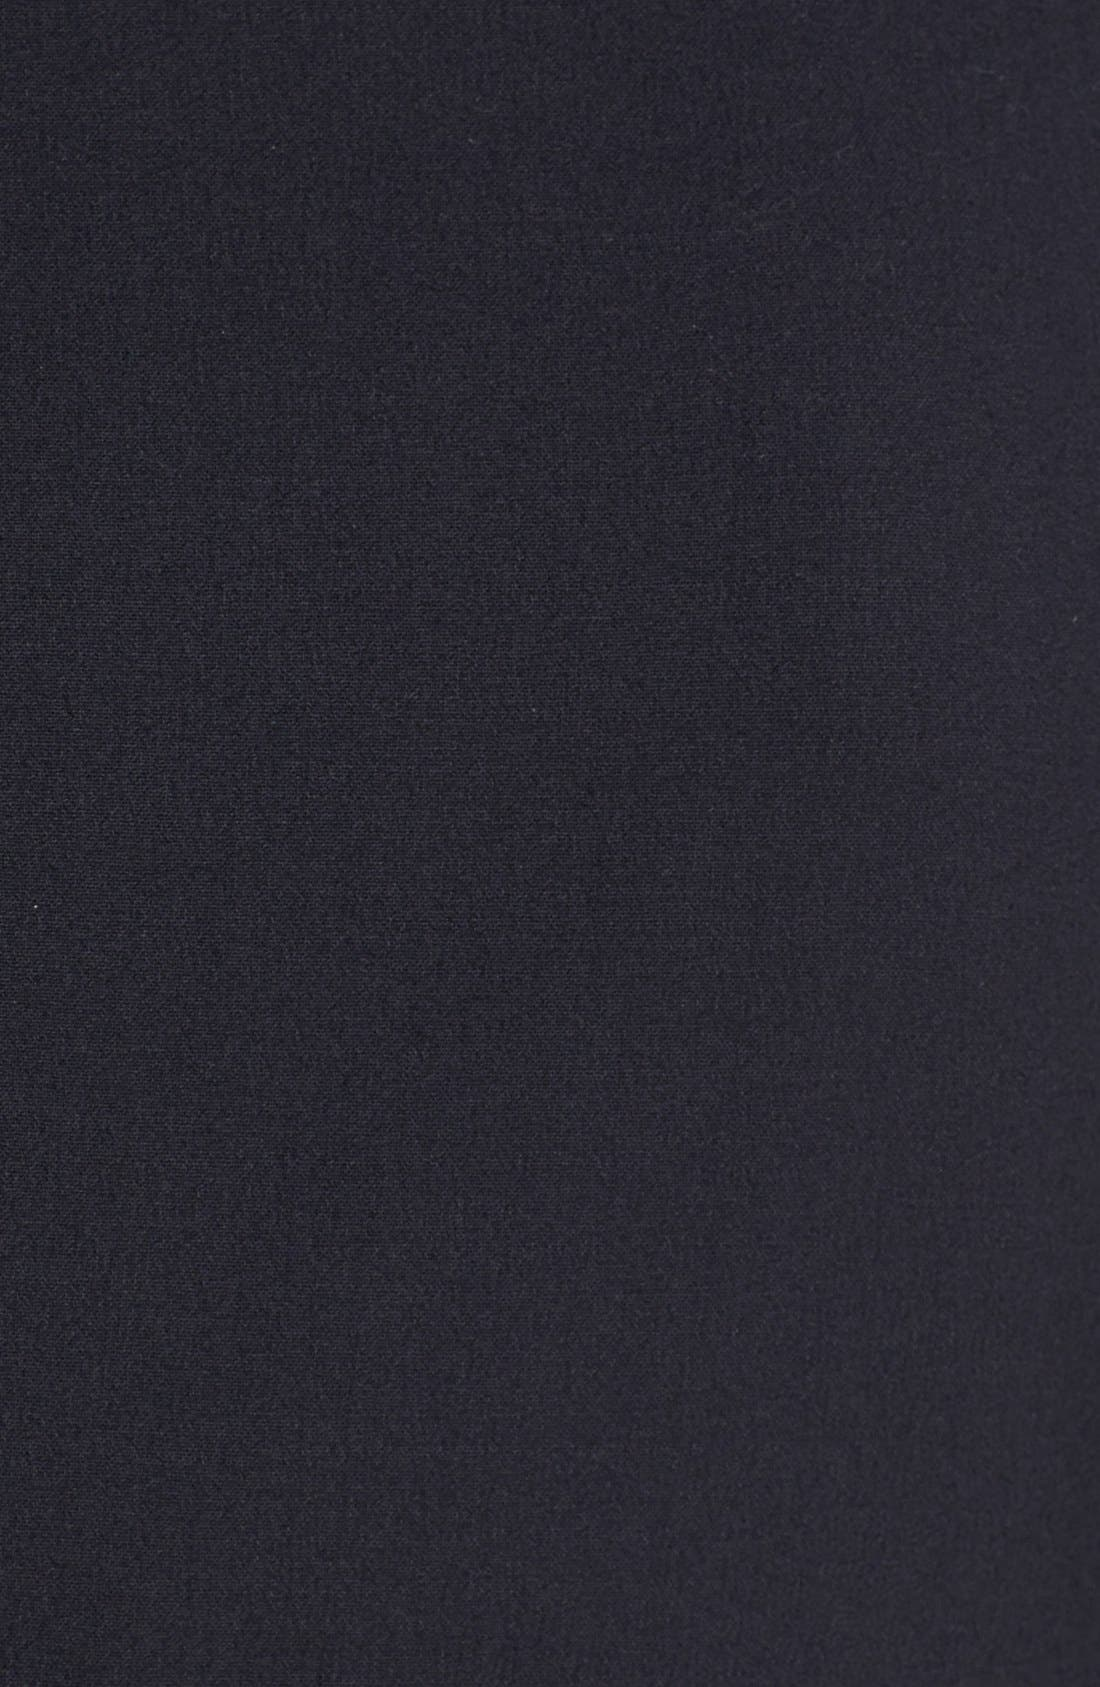 Alternate Image 3  - Lafayette 148 New York 'Alban' Jacket